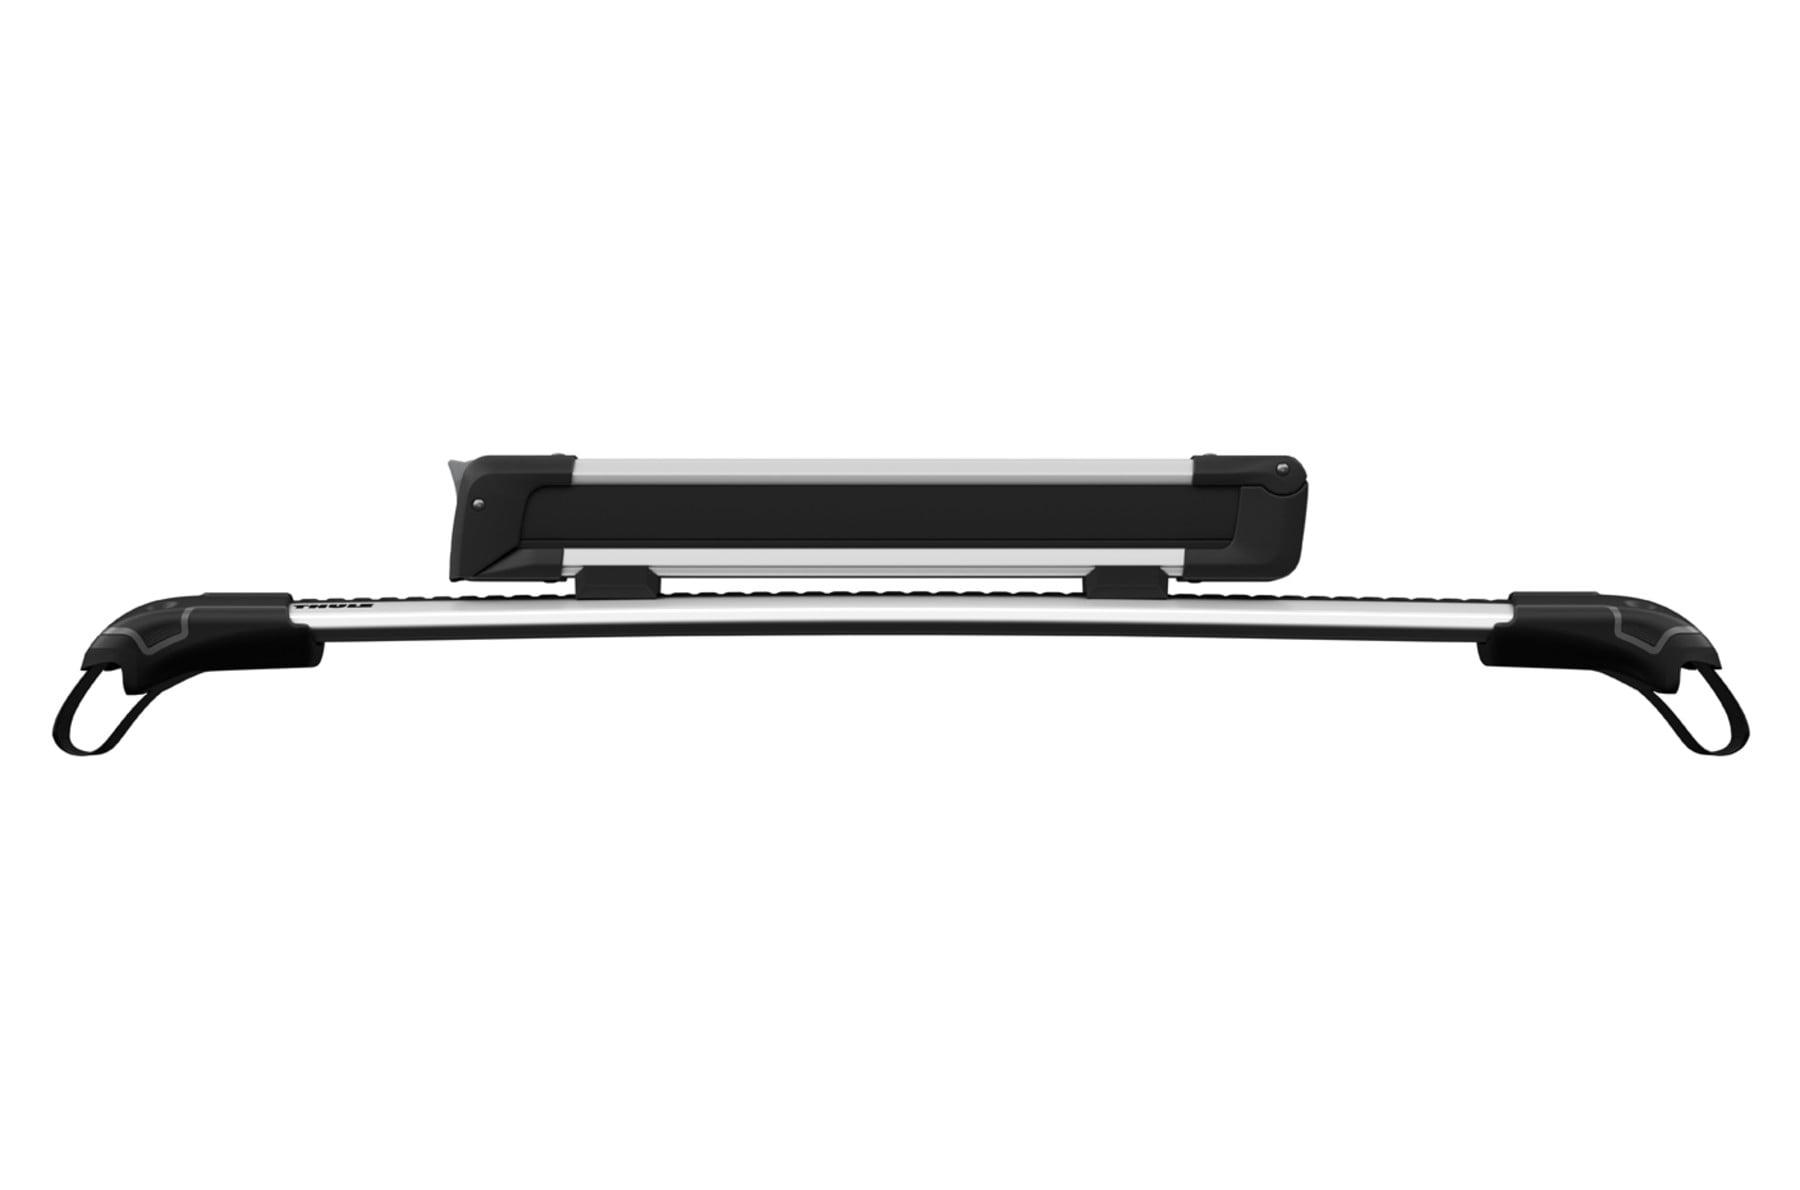 Suport schiuri Thule SnowPack 7324 cu prindere pe bare transversale din aluminiu cu profil T 6